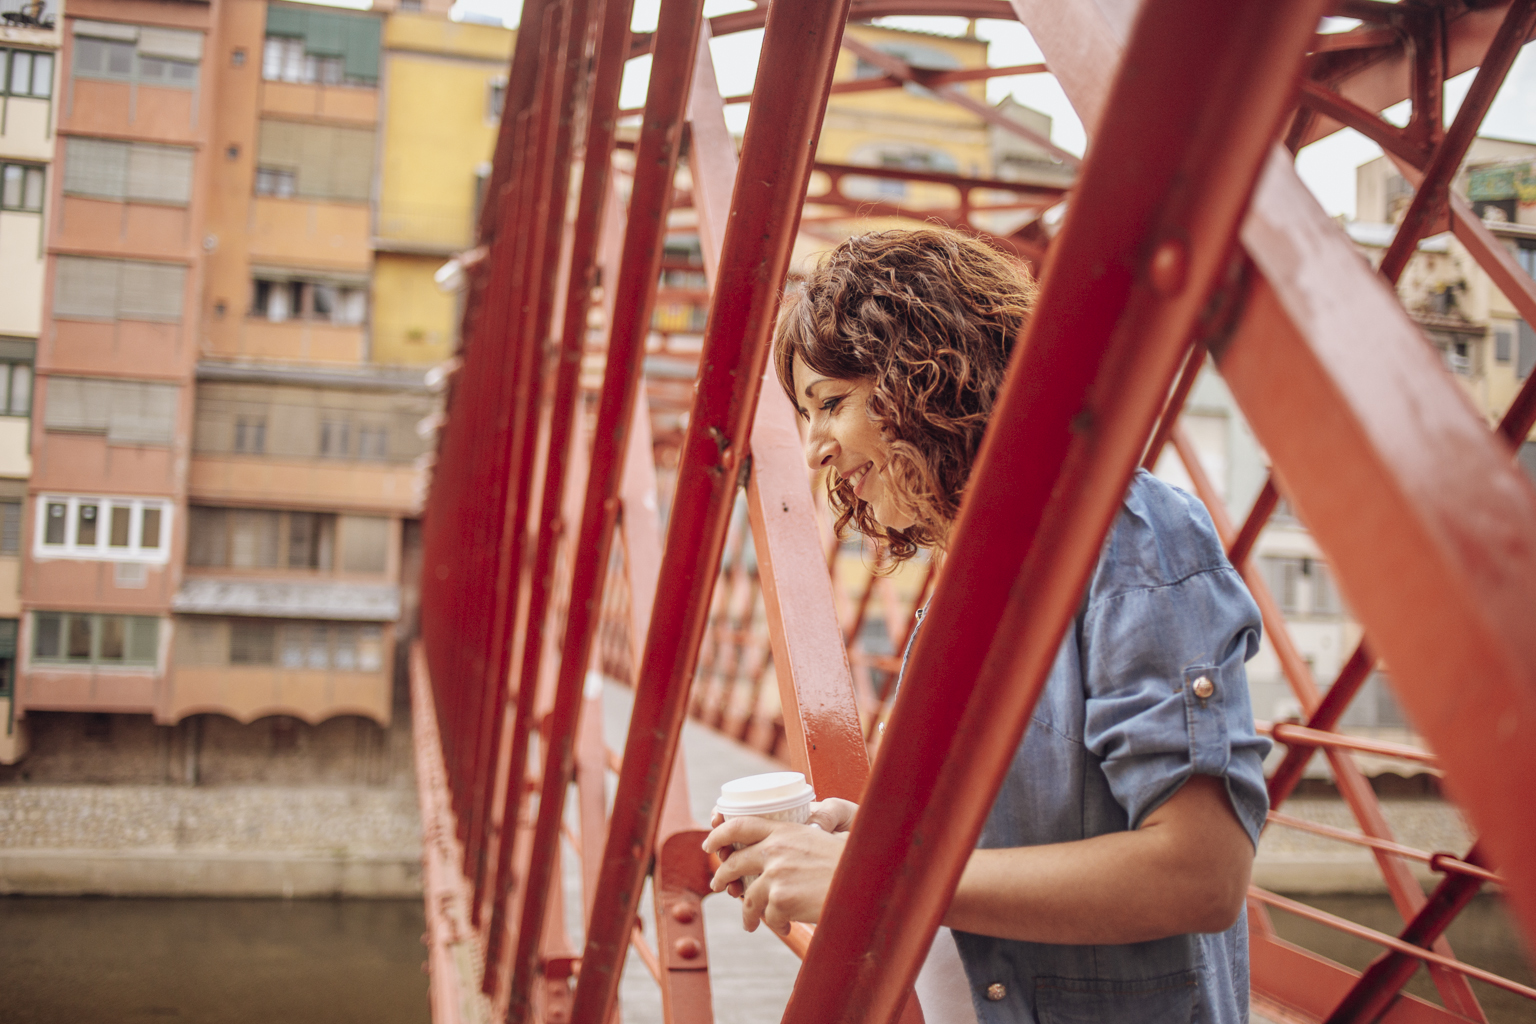 fotografo book empresarial girona :: fotografía corporativa :: imagen corporativa :: book profesional :: fotógrafo Girona